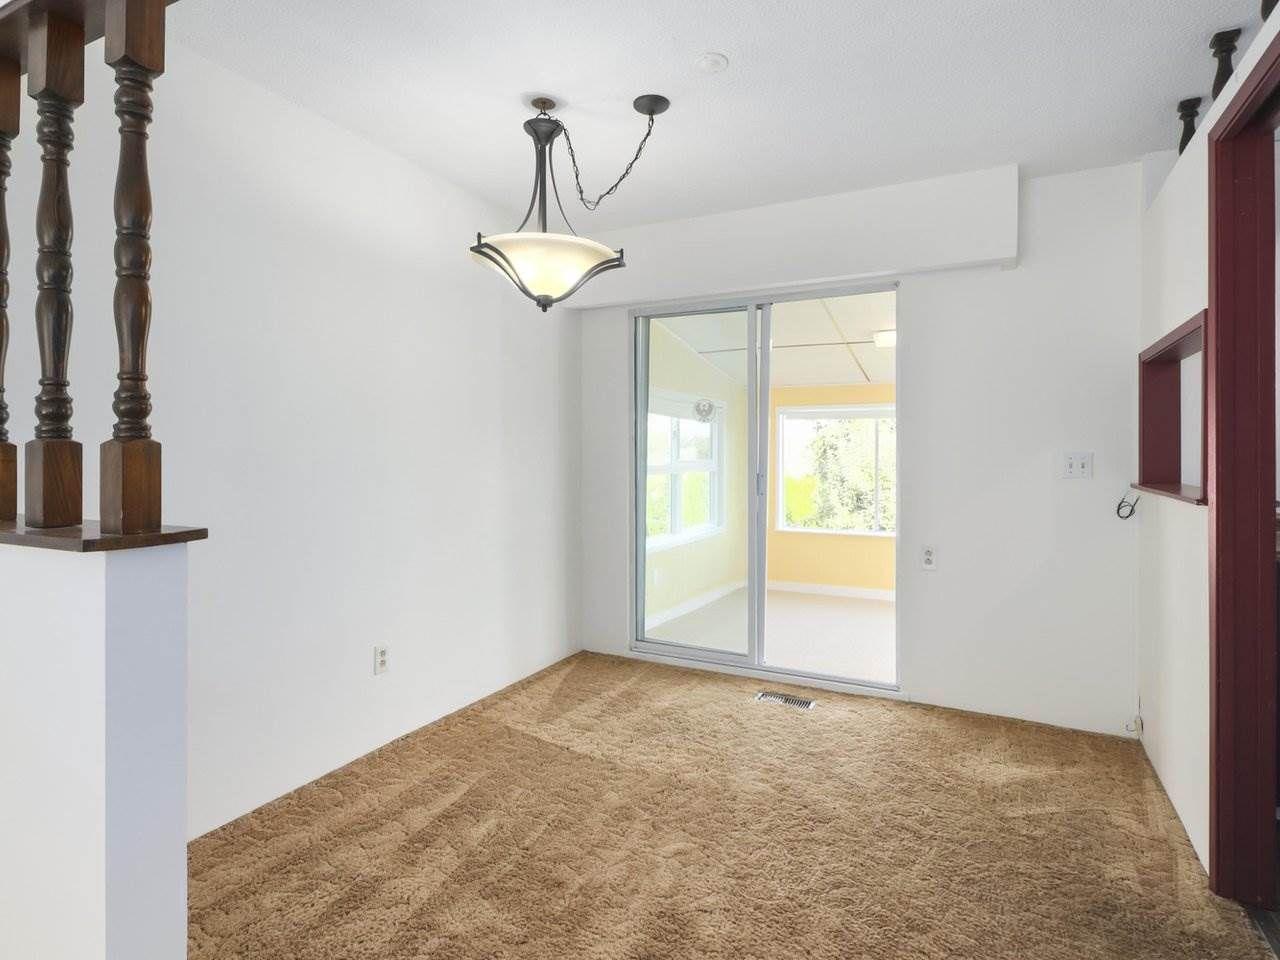 Photo 6: Photos: 1426 KENT Street: White Rock House for sale (South Surrey White Rock)  : MLS®# R2406738